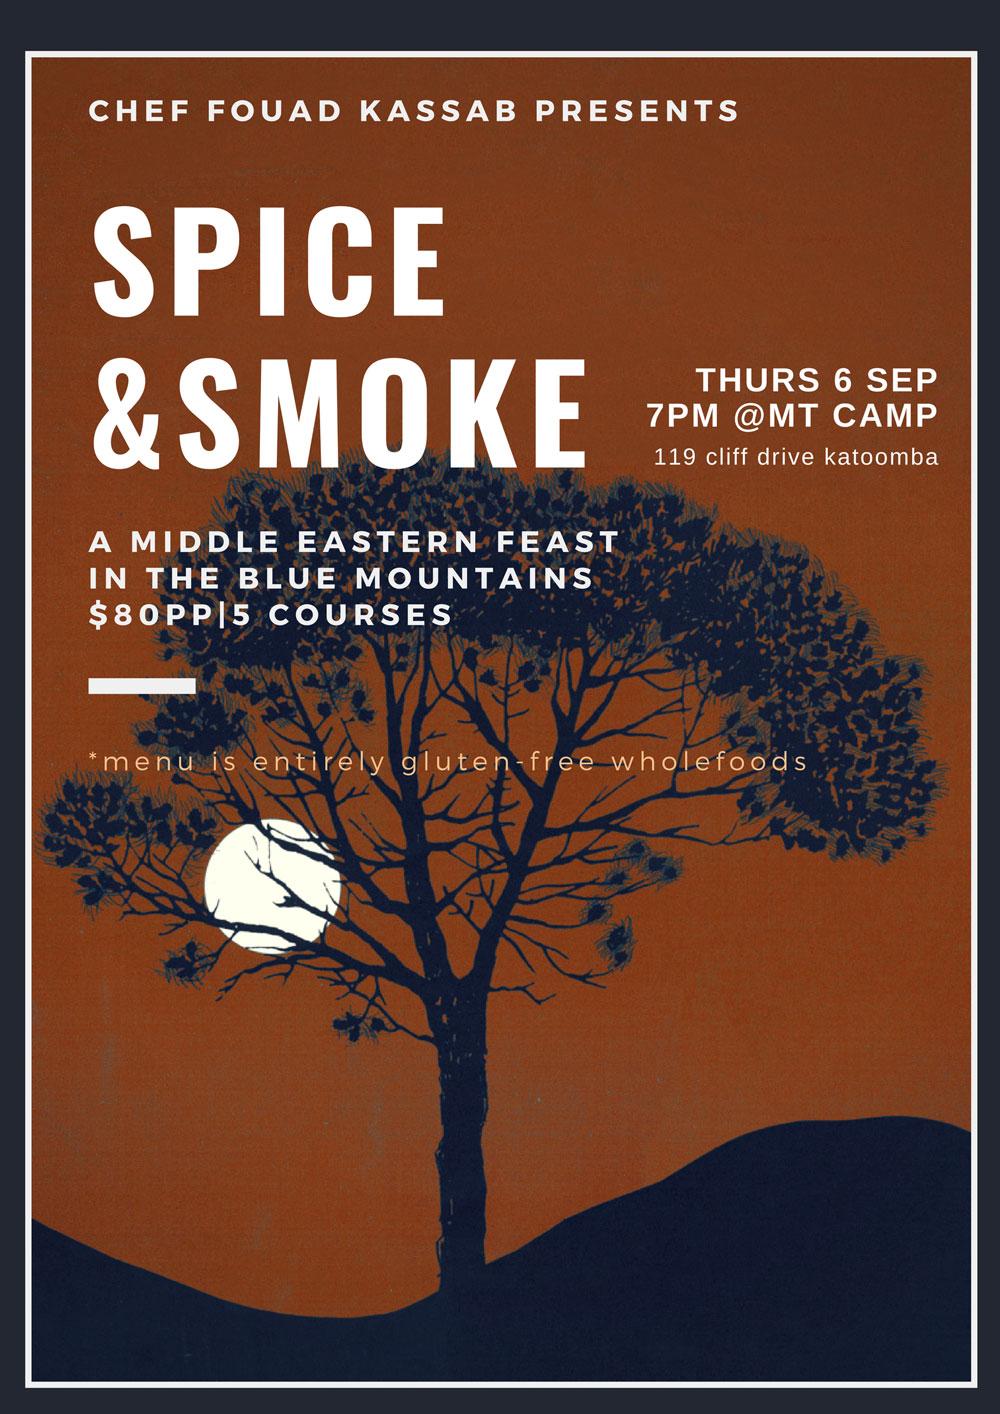 Spice & Smoke